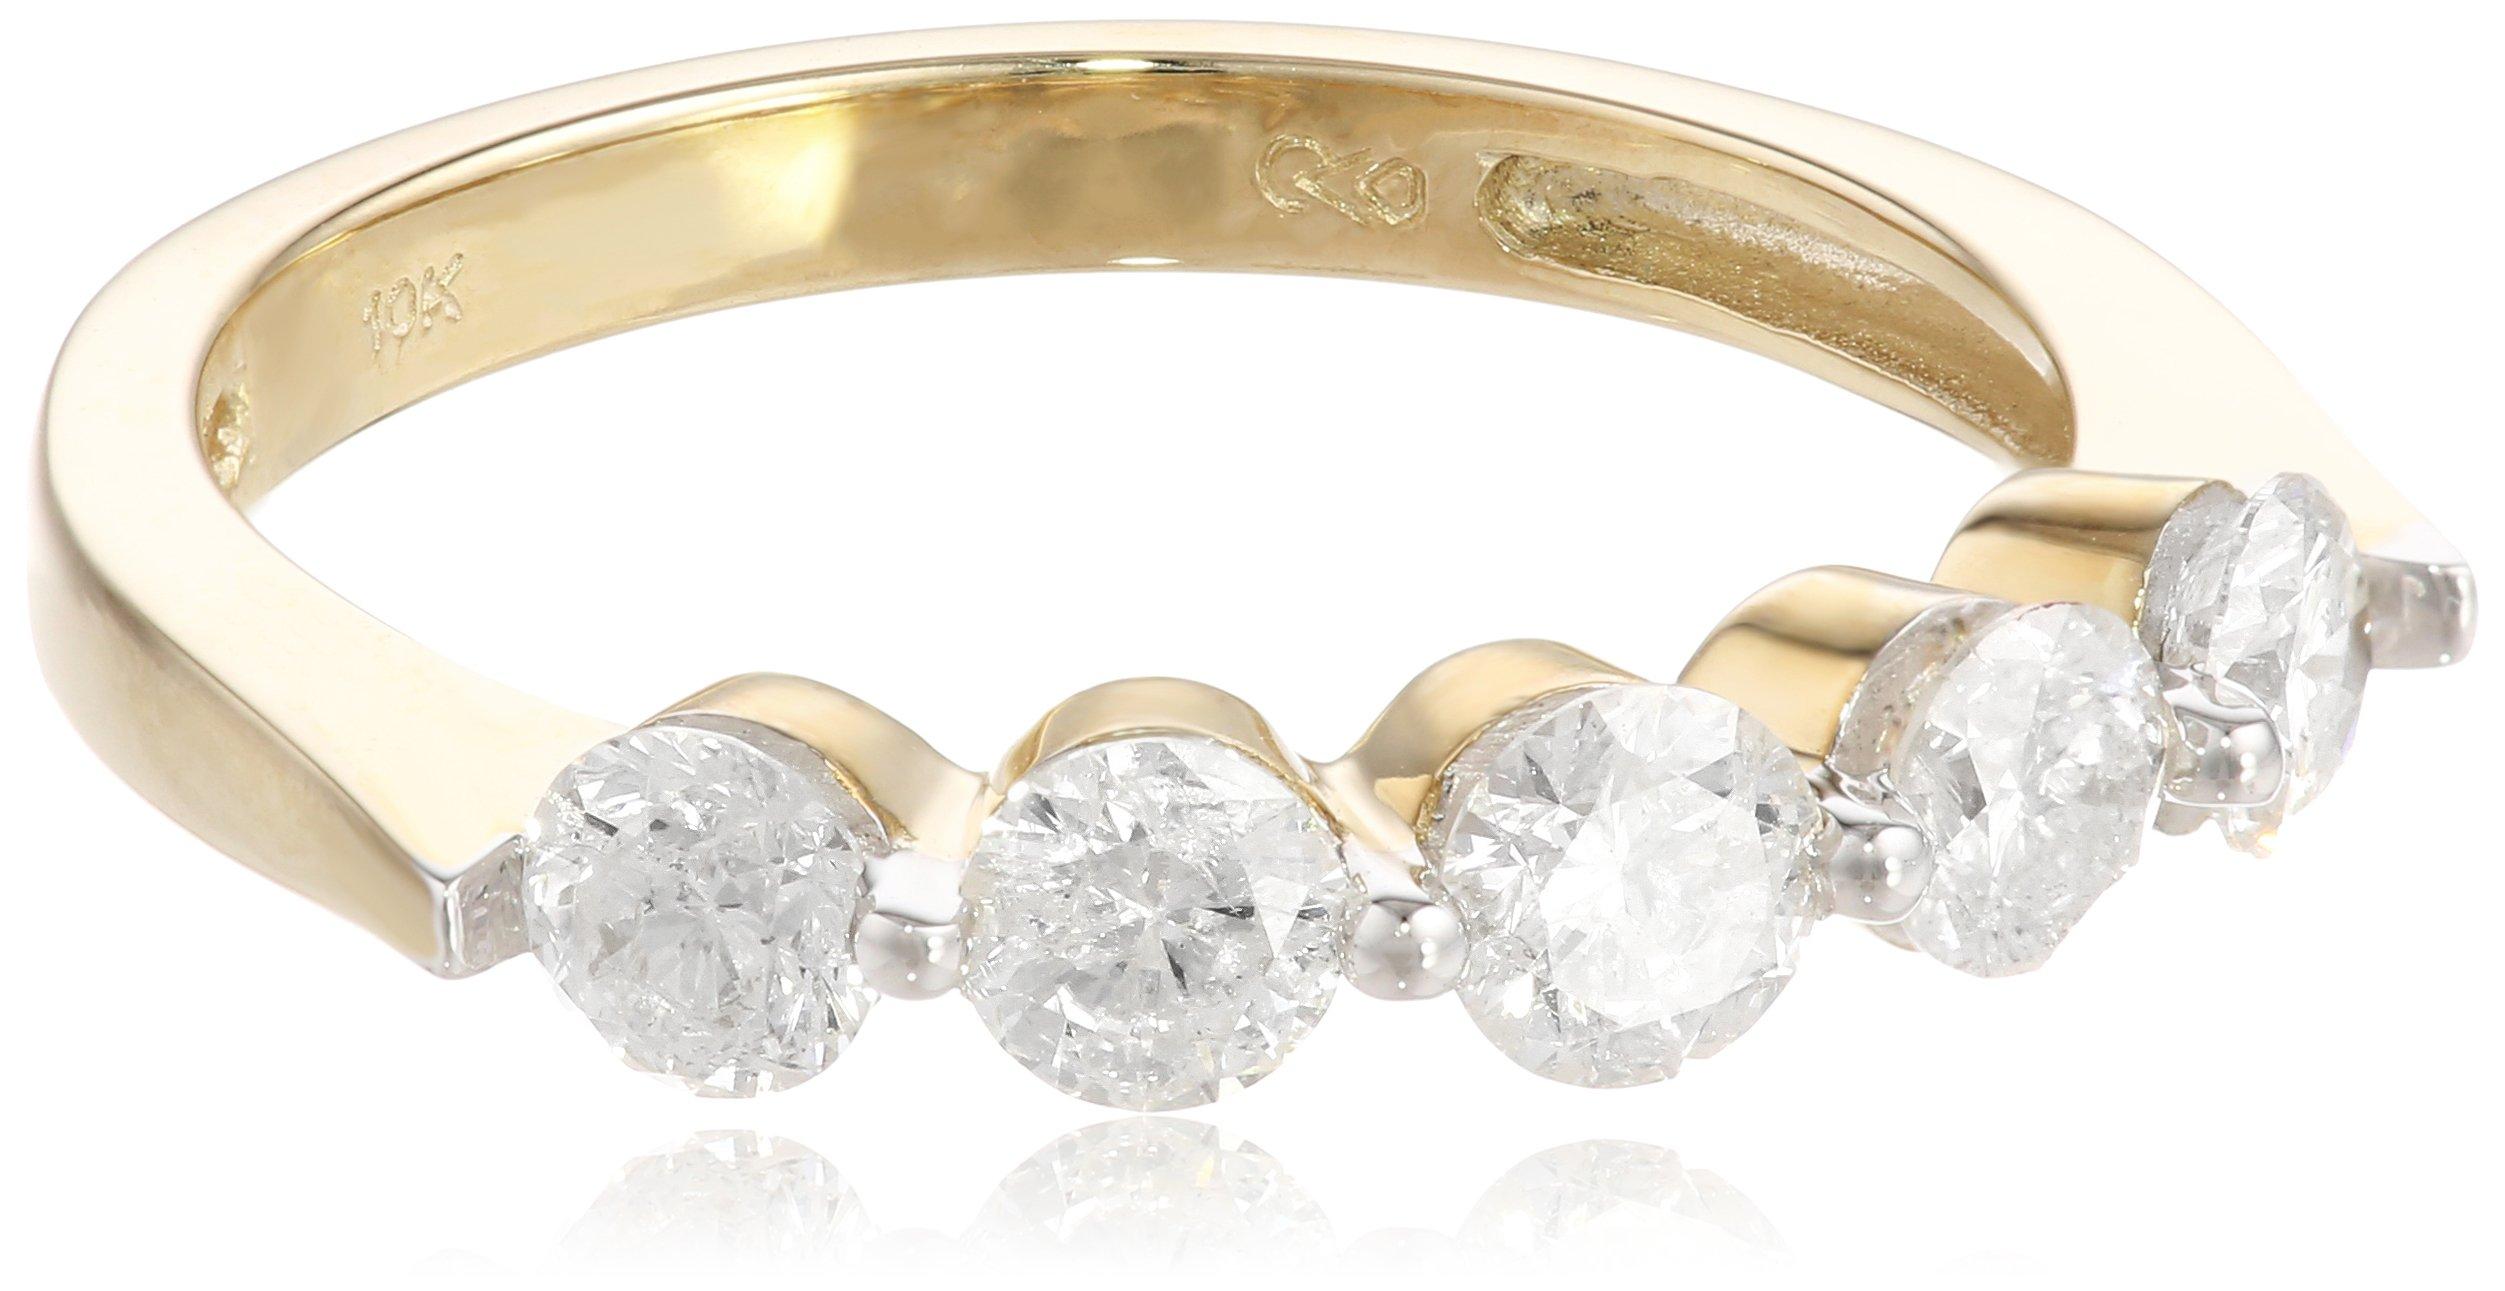 10k White Gold 5-Stone Diamond Ring (1 cttw, H-I Color, I2-I3 Clarity), Size 8